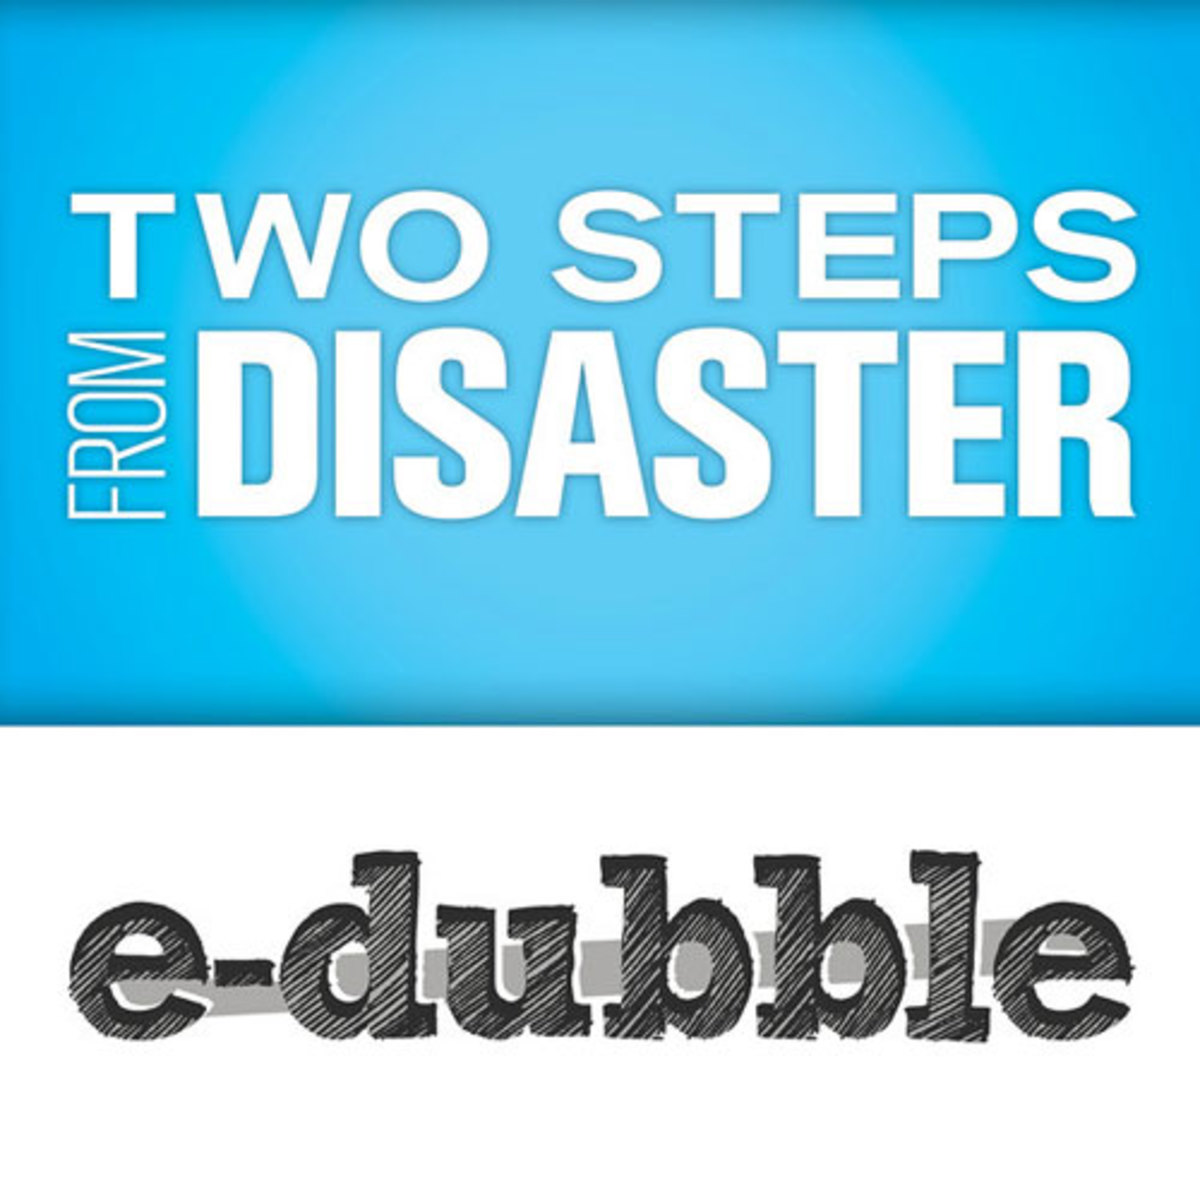 edubble-twosteps.jpg